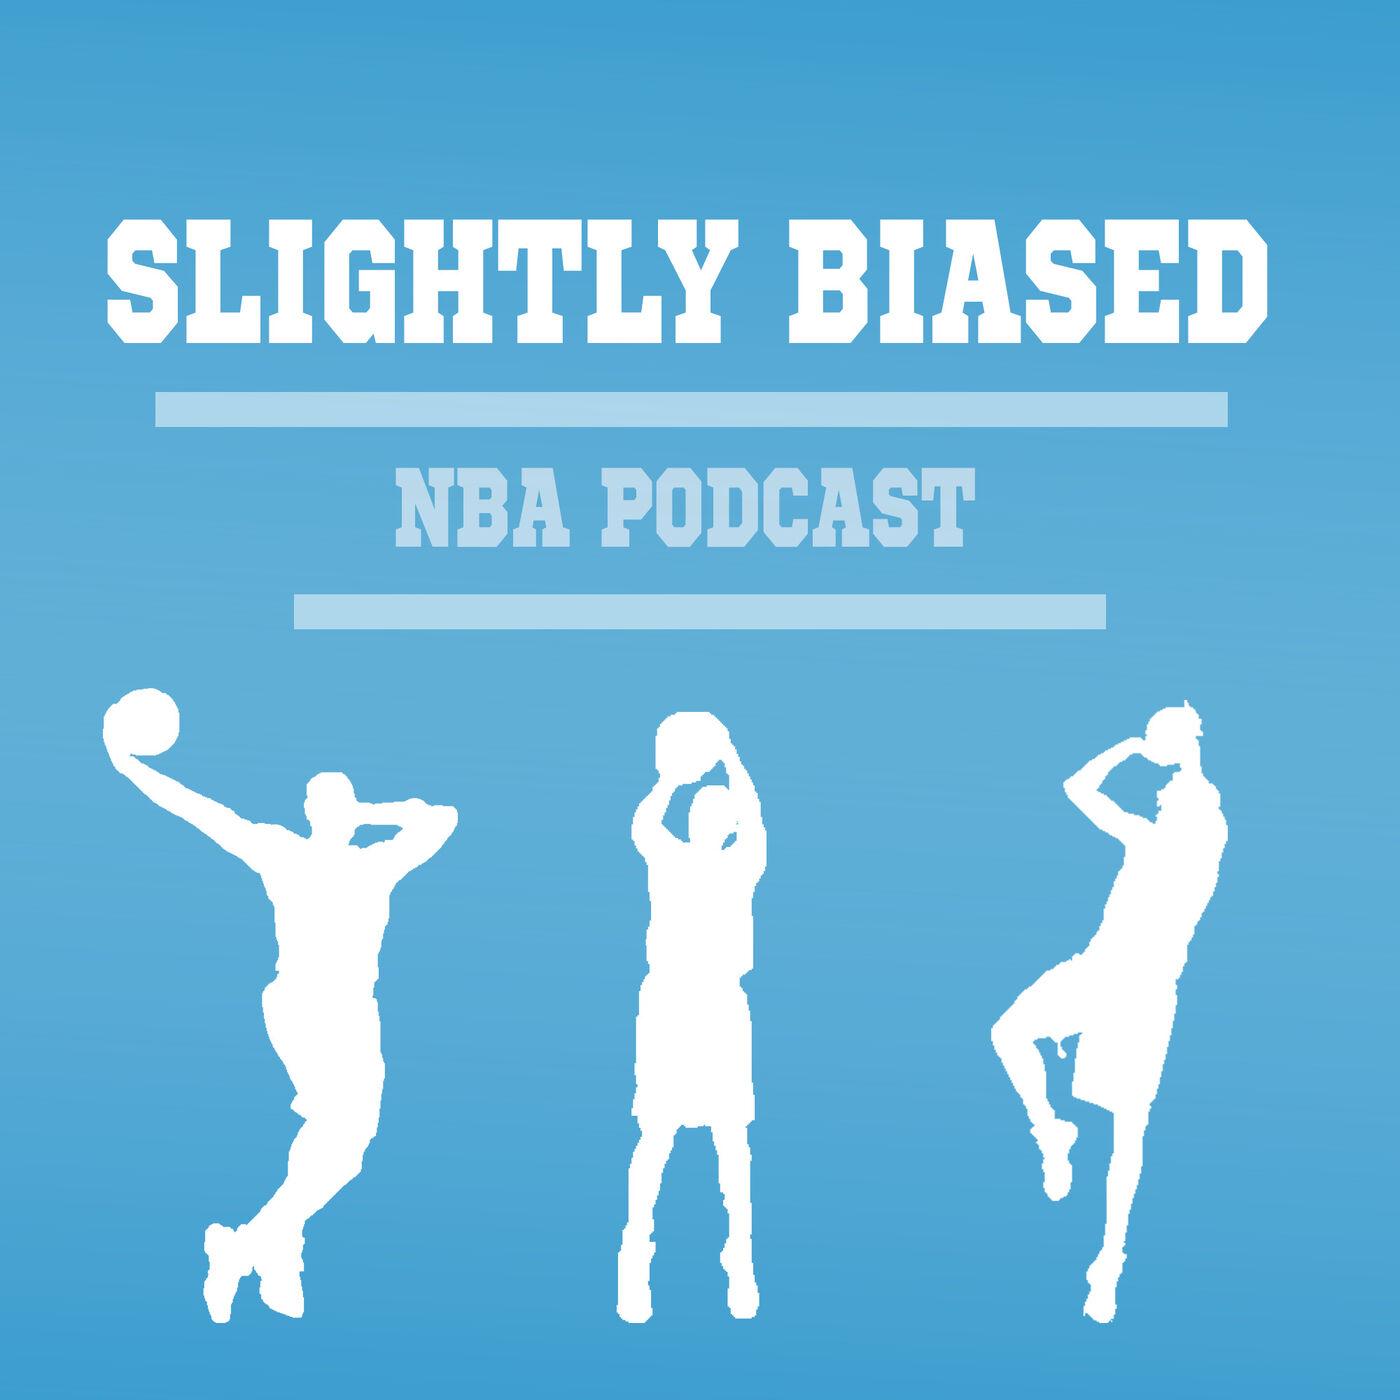 David Levy Steps Down and Kristaps Porzingis Has Struggled - Slightly Biased NBA Podcast Ep. 6